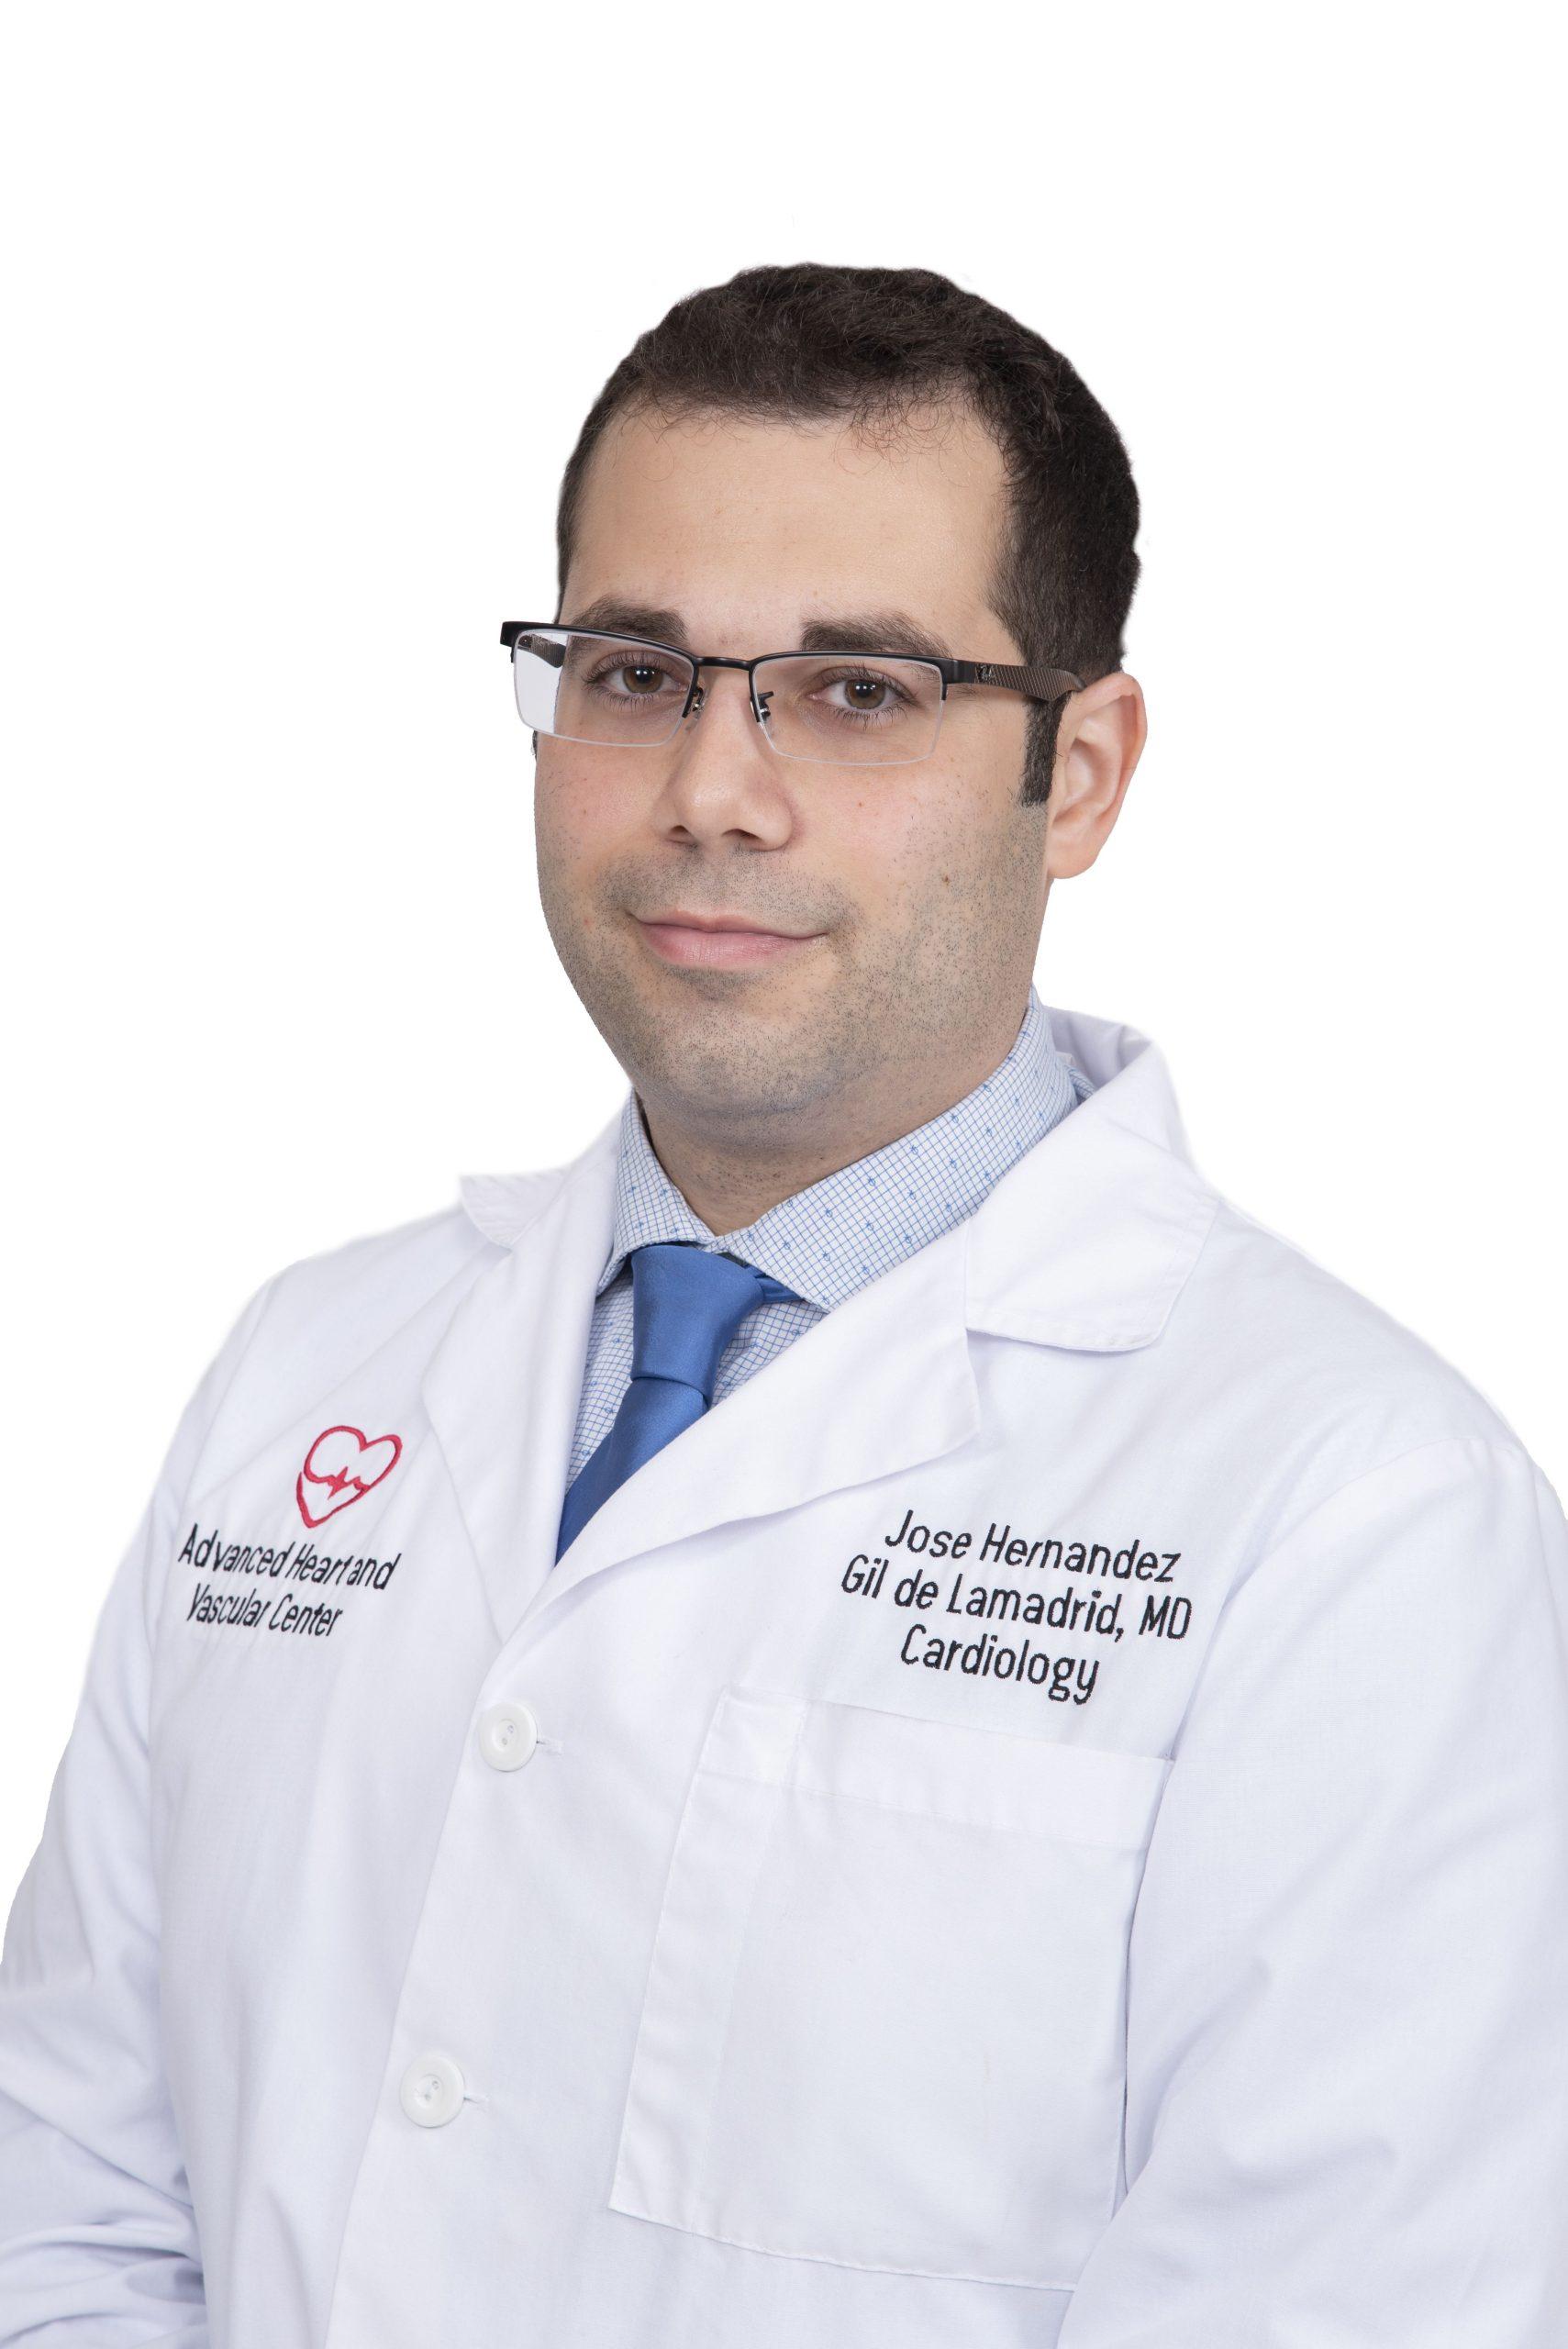 Jose-Hernandez-Gil-Lamadrid-MD